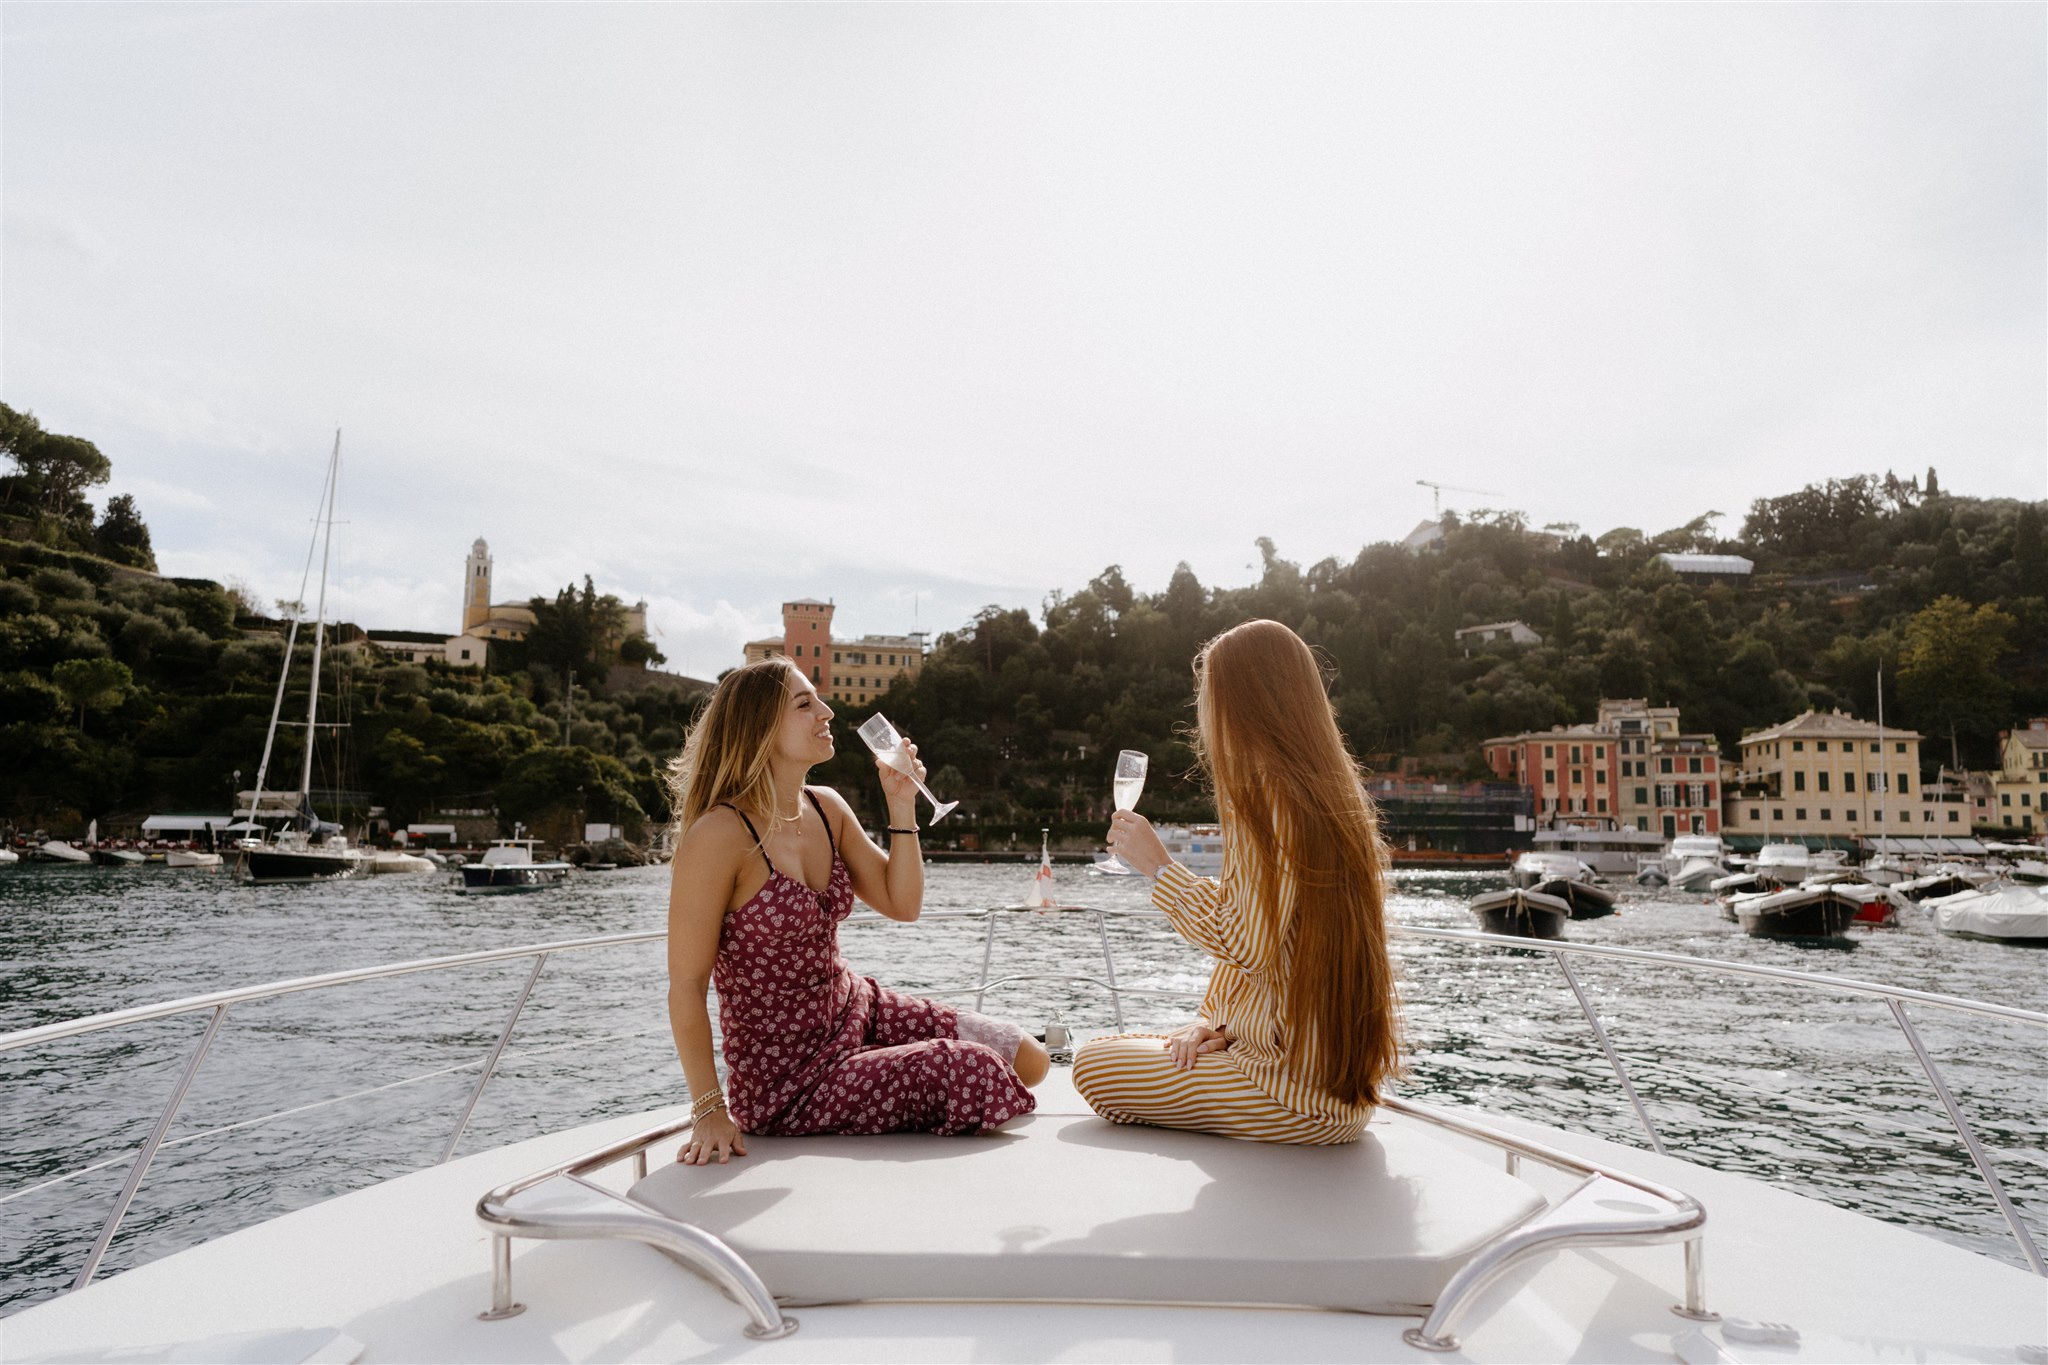 Cesare Charter Portofino - Maritime tour, transfer and charter